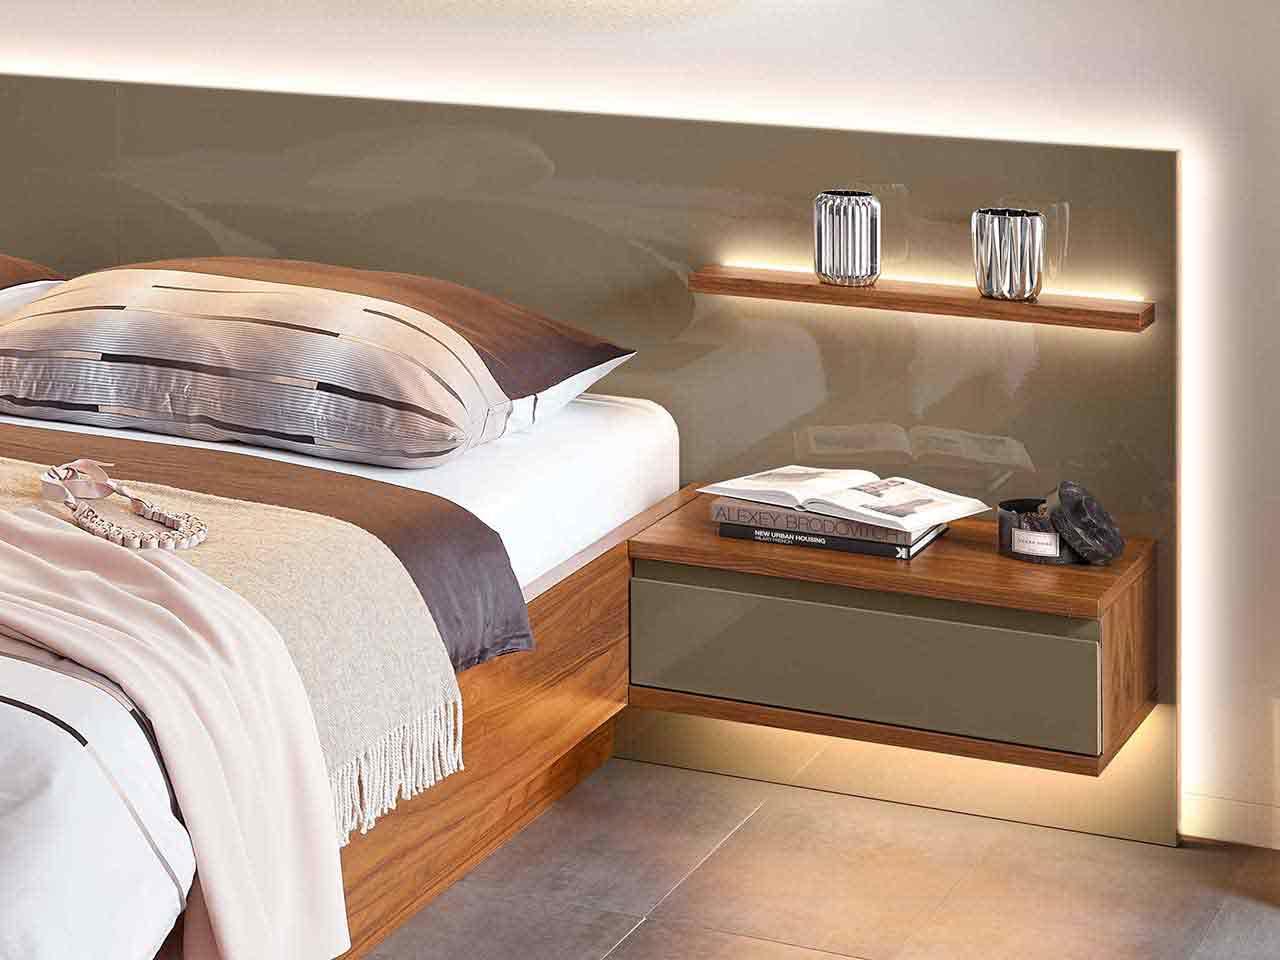 Bett Schlafzimmer Enjoy Lack terra